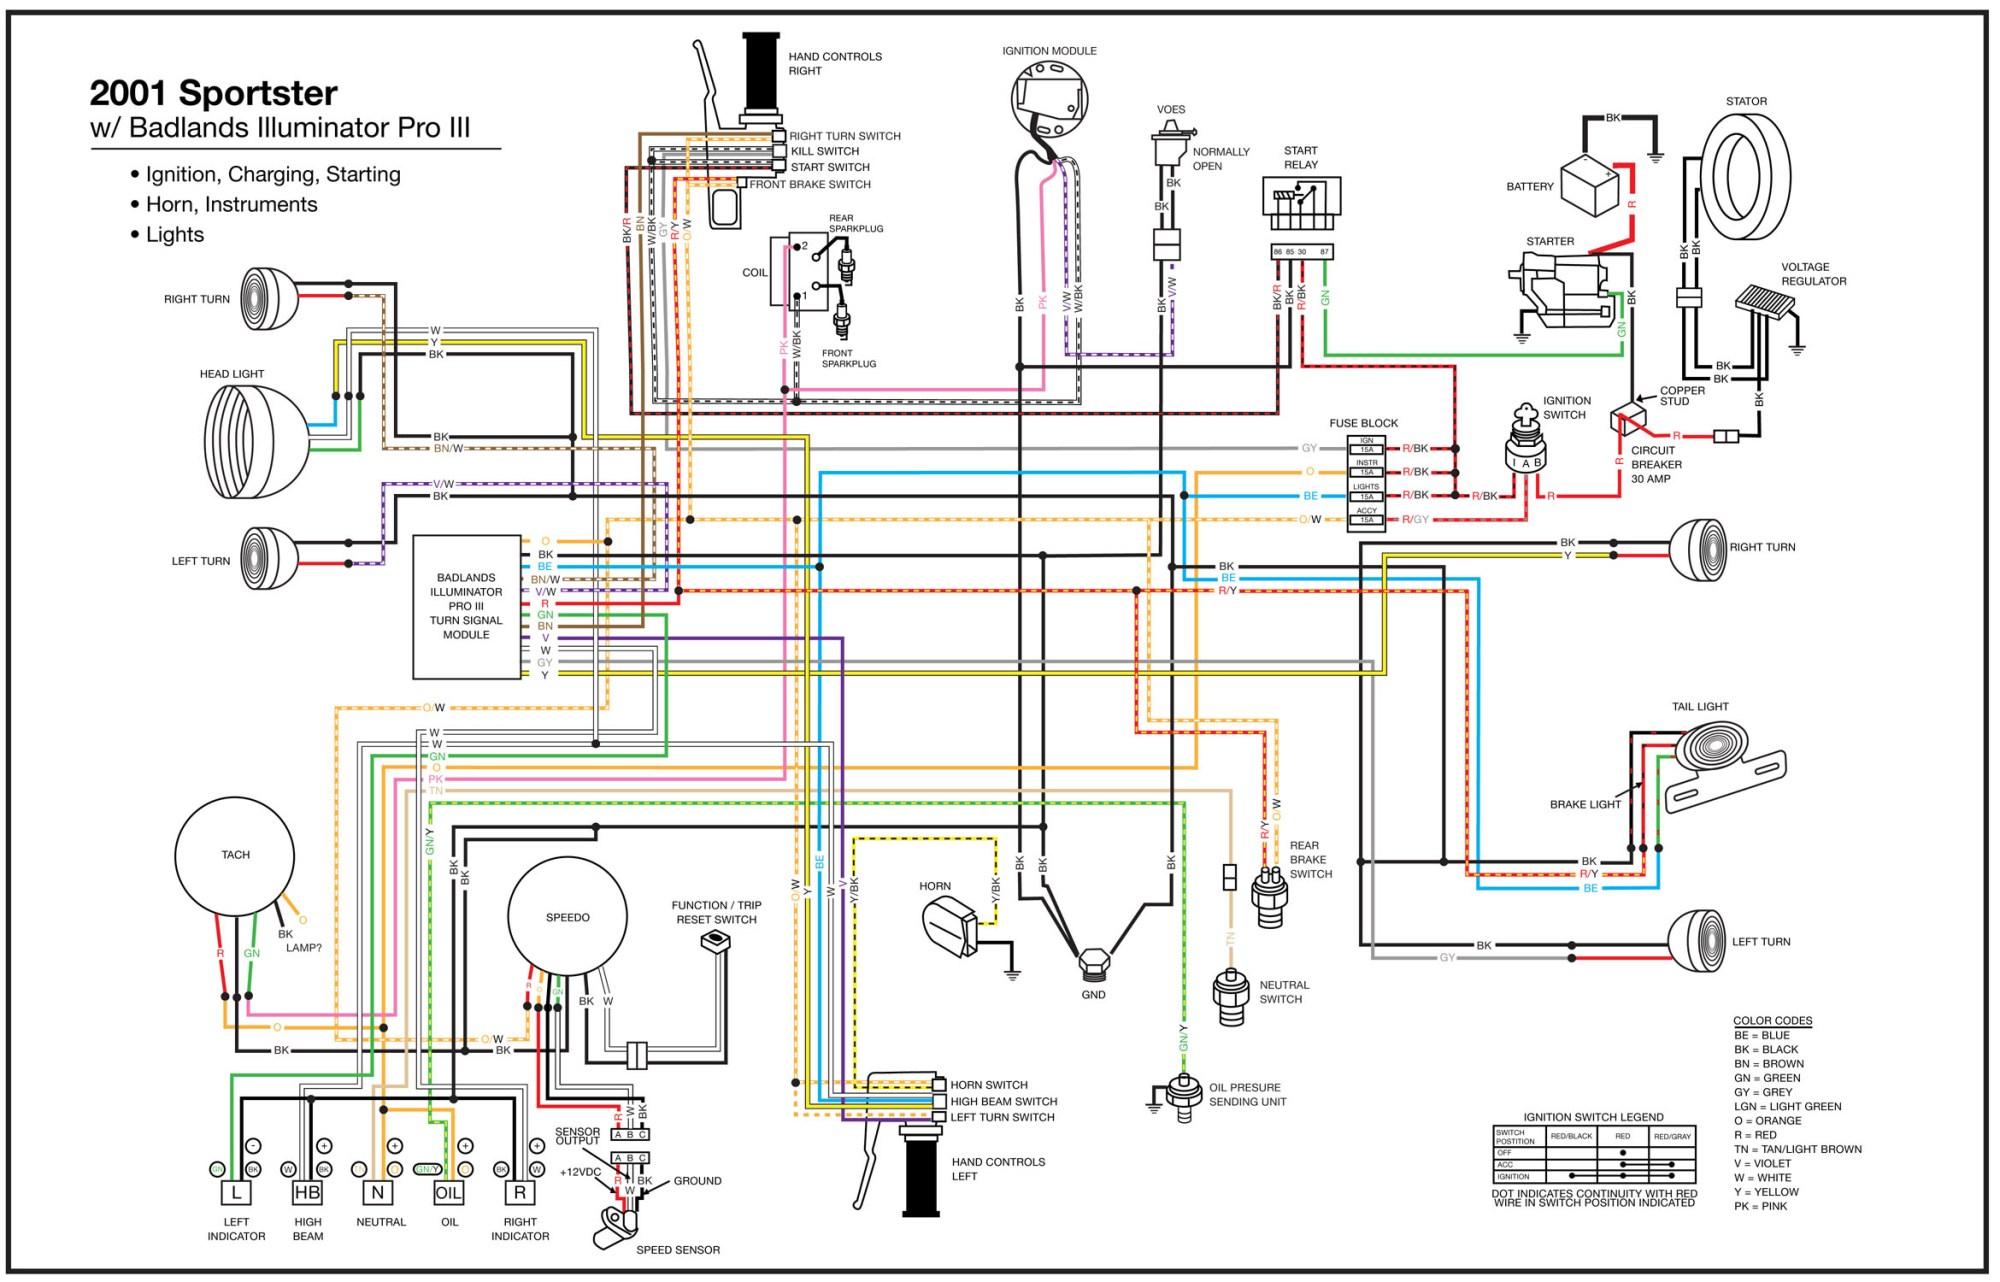 81 Flh Harley Davidson Wiring Diagram